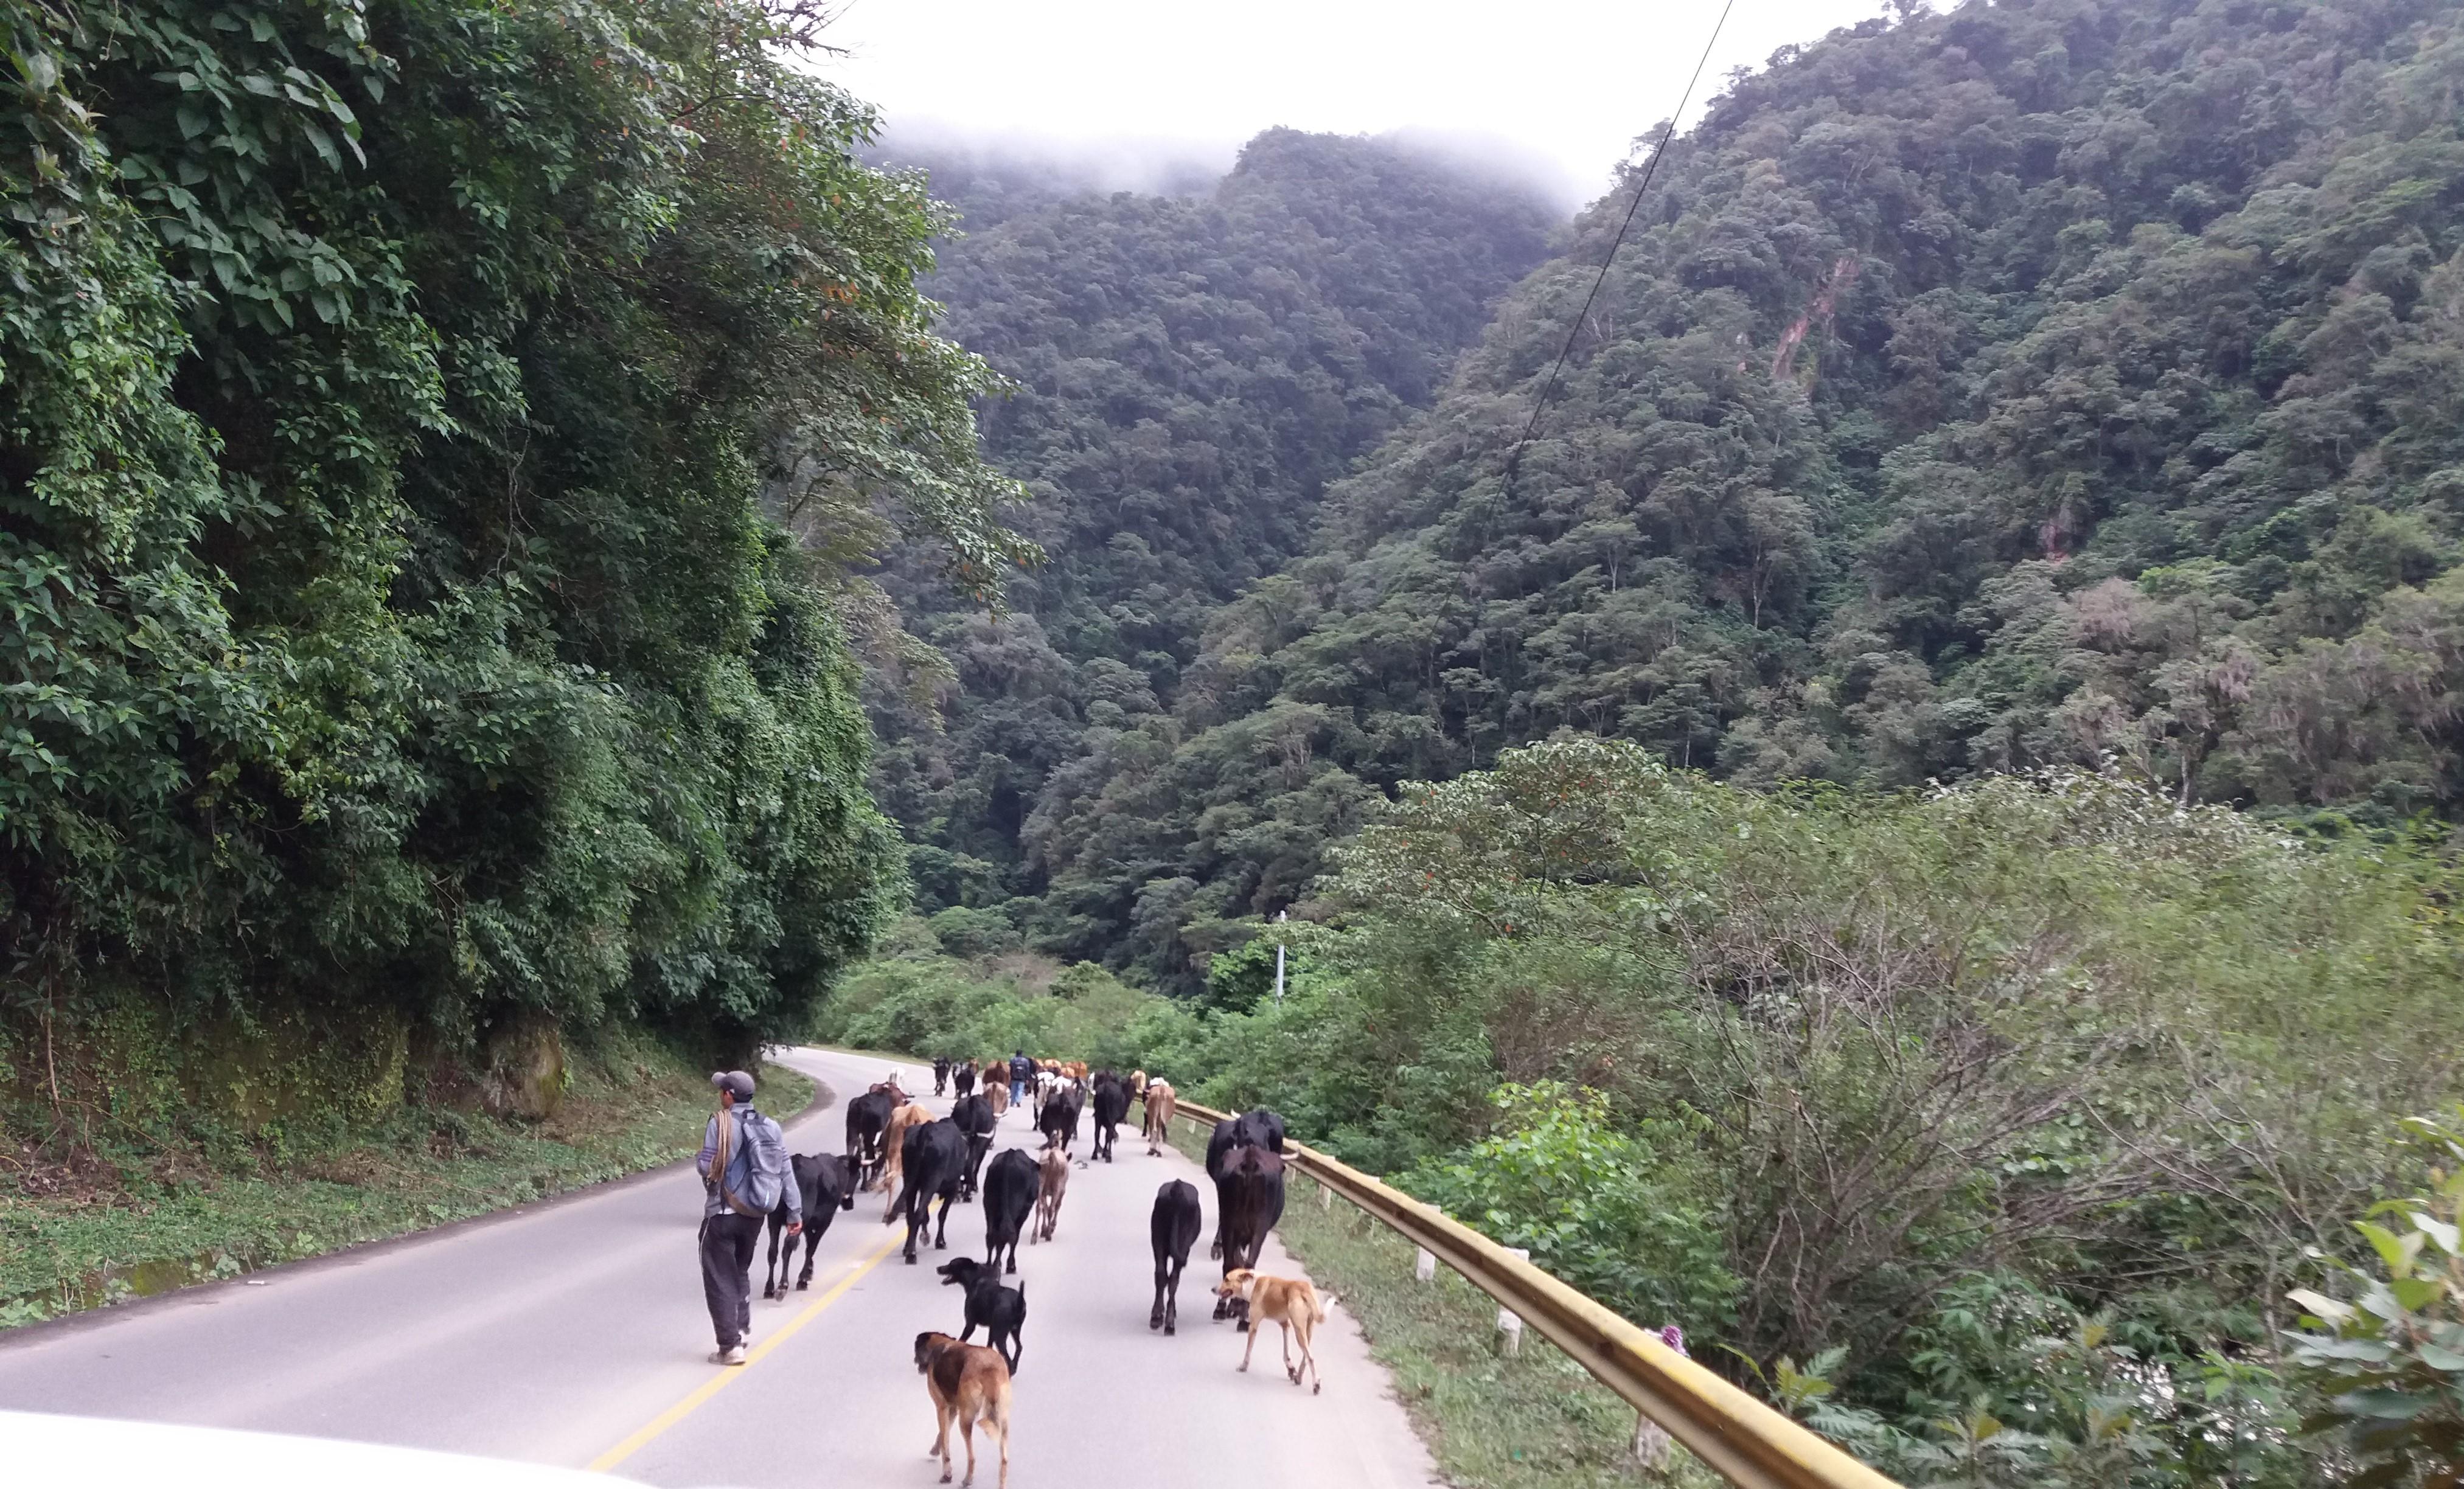 Herd moving in rainforest